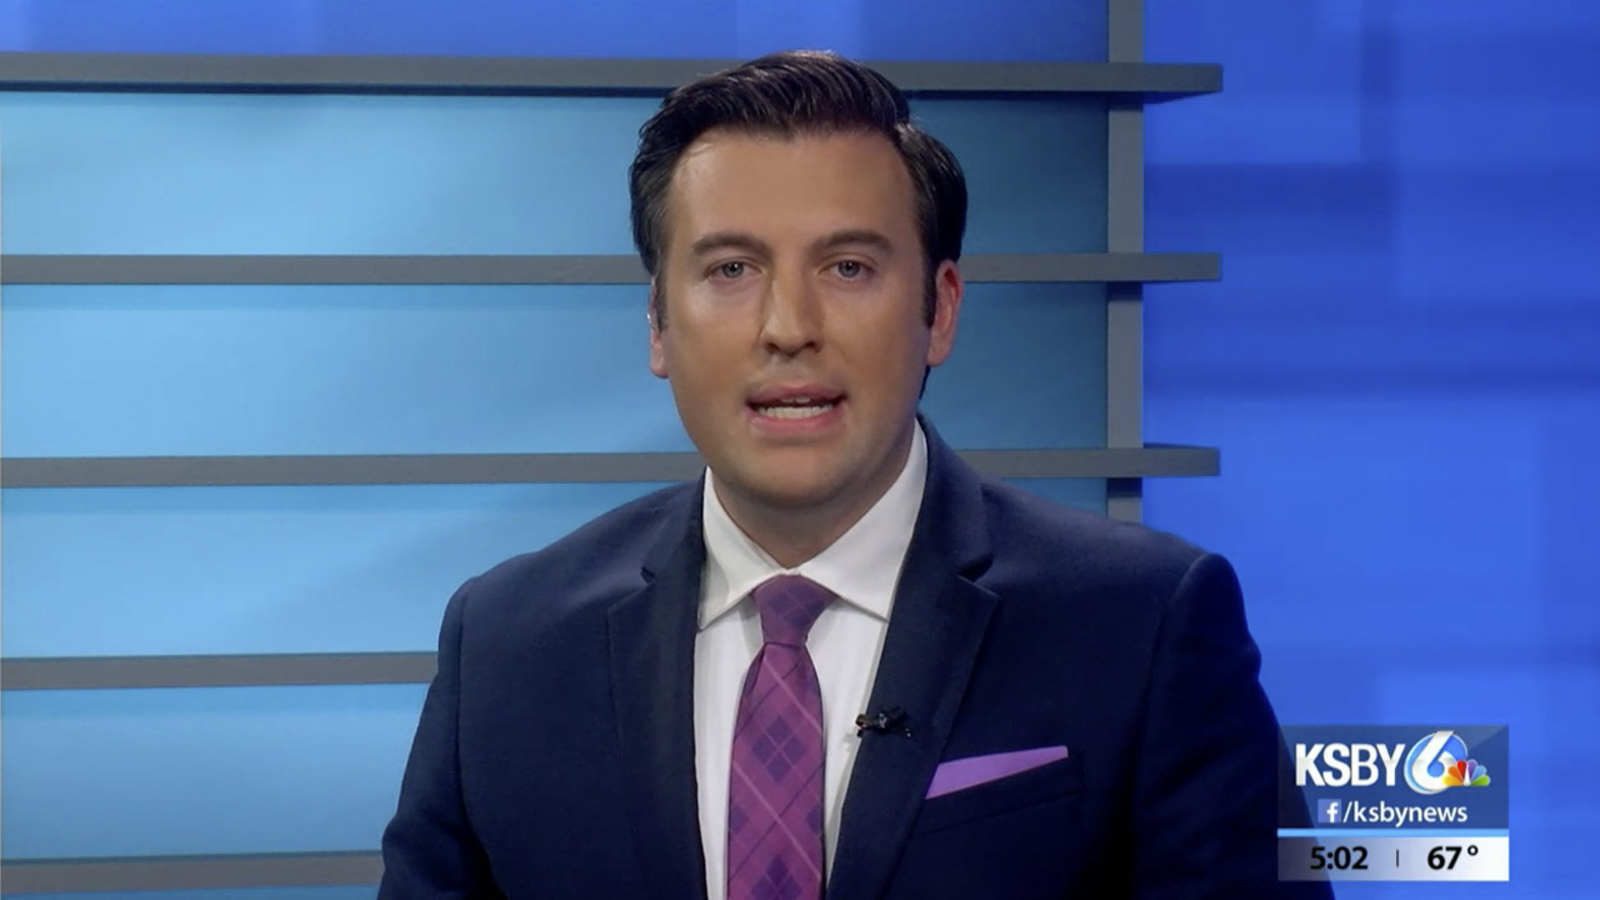 ncs_ksby-6-news-tv-studio-devlin_0006